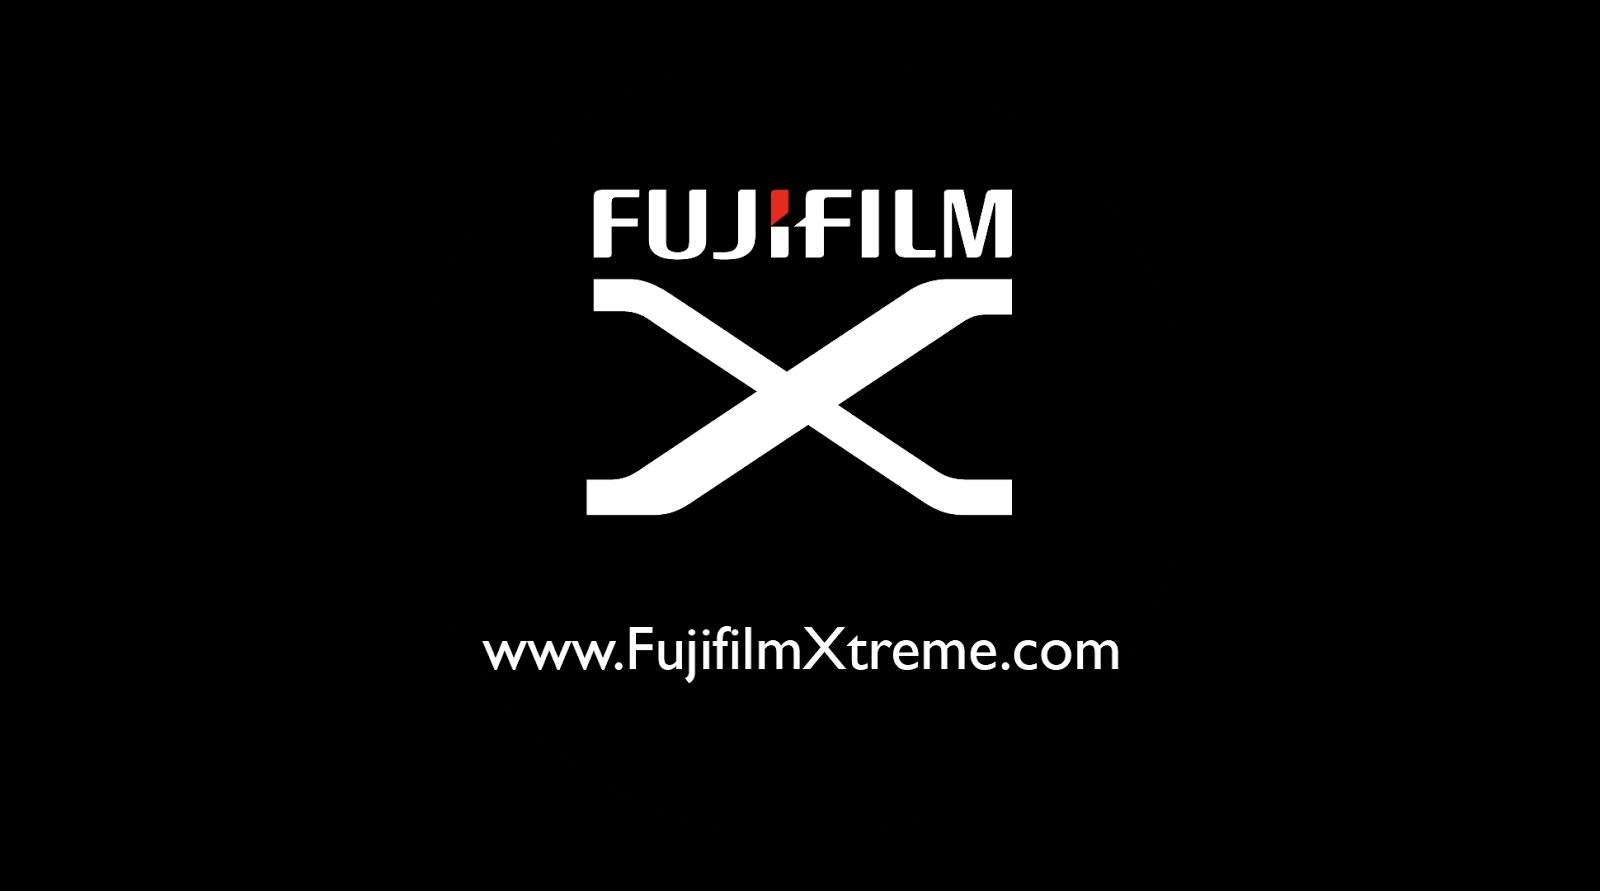 Welcome To Fujifilm X-Treme